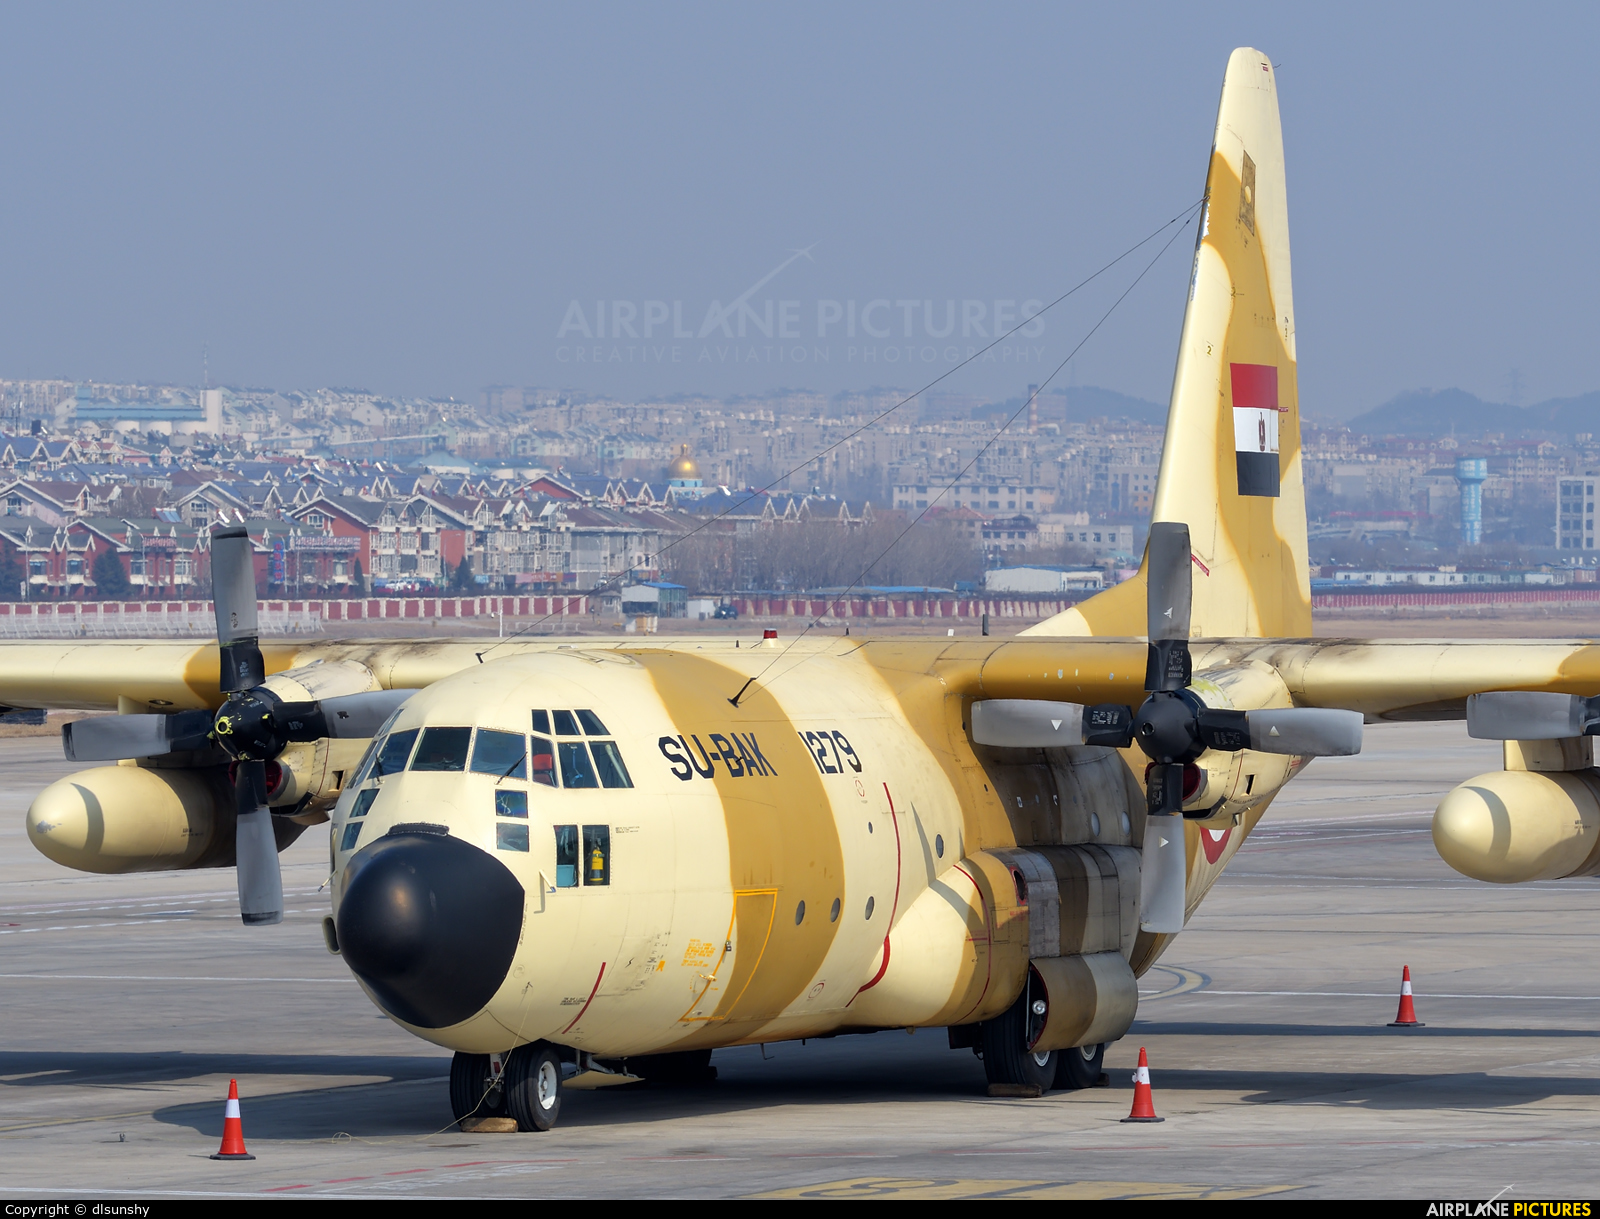 Egypt - Air Force 1279 aircraft at Dalian Zhoushuizi Int'l